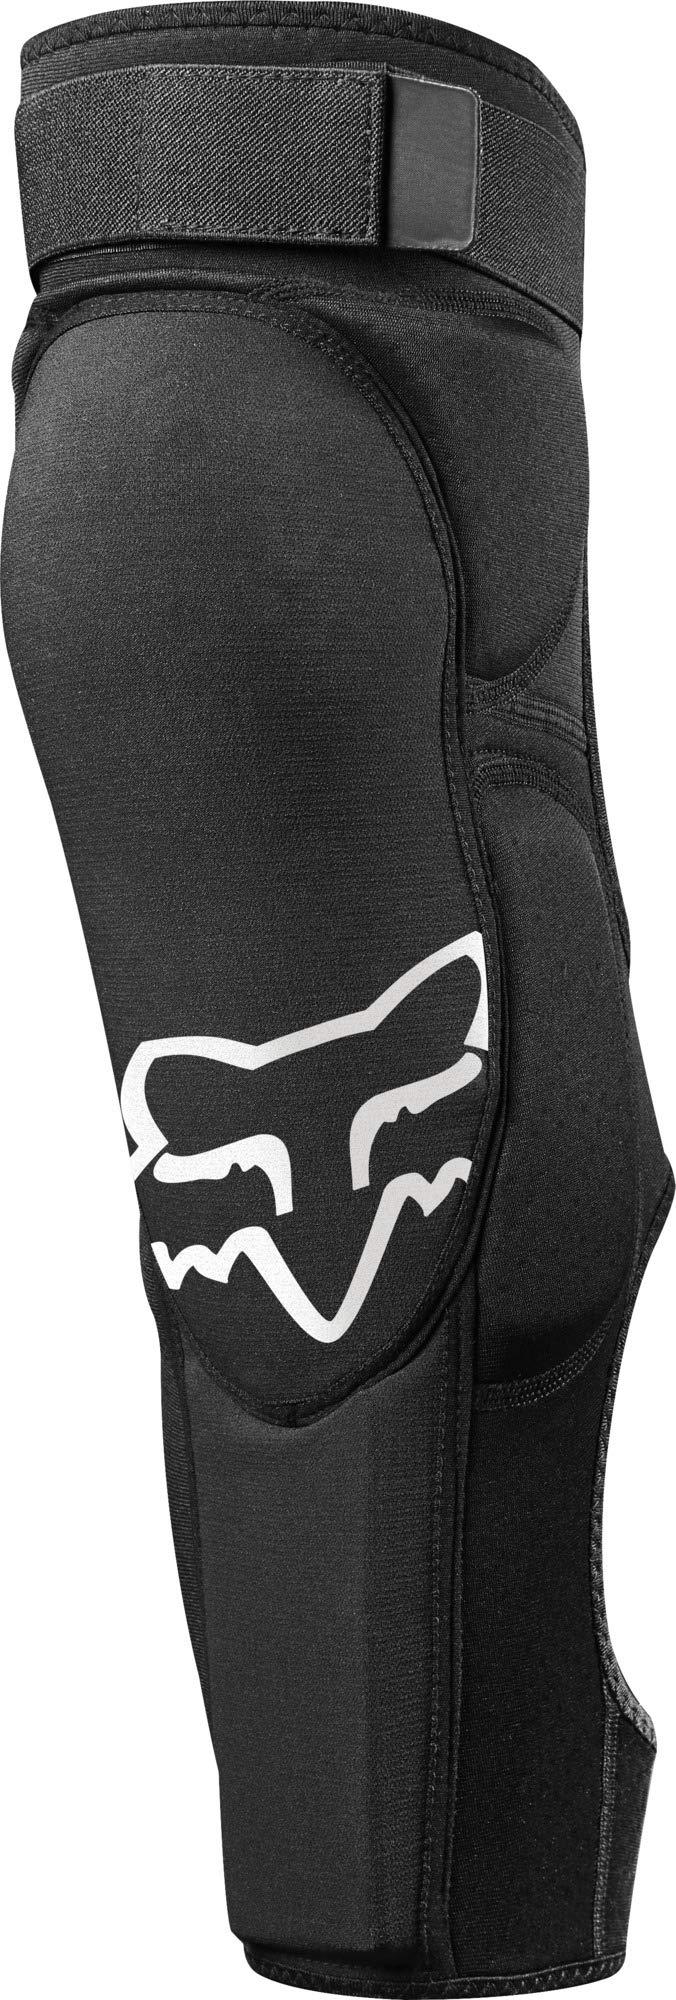 Fox Racing Launch Pro MTB Knee/Shin Guard (Black, Small) by Fox Racing